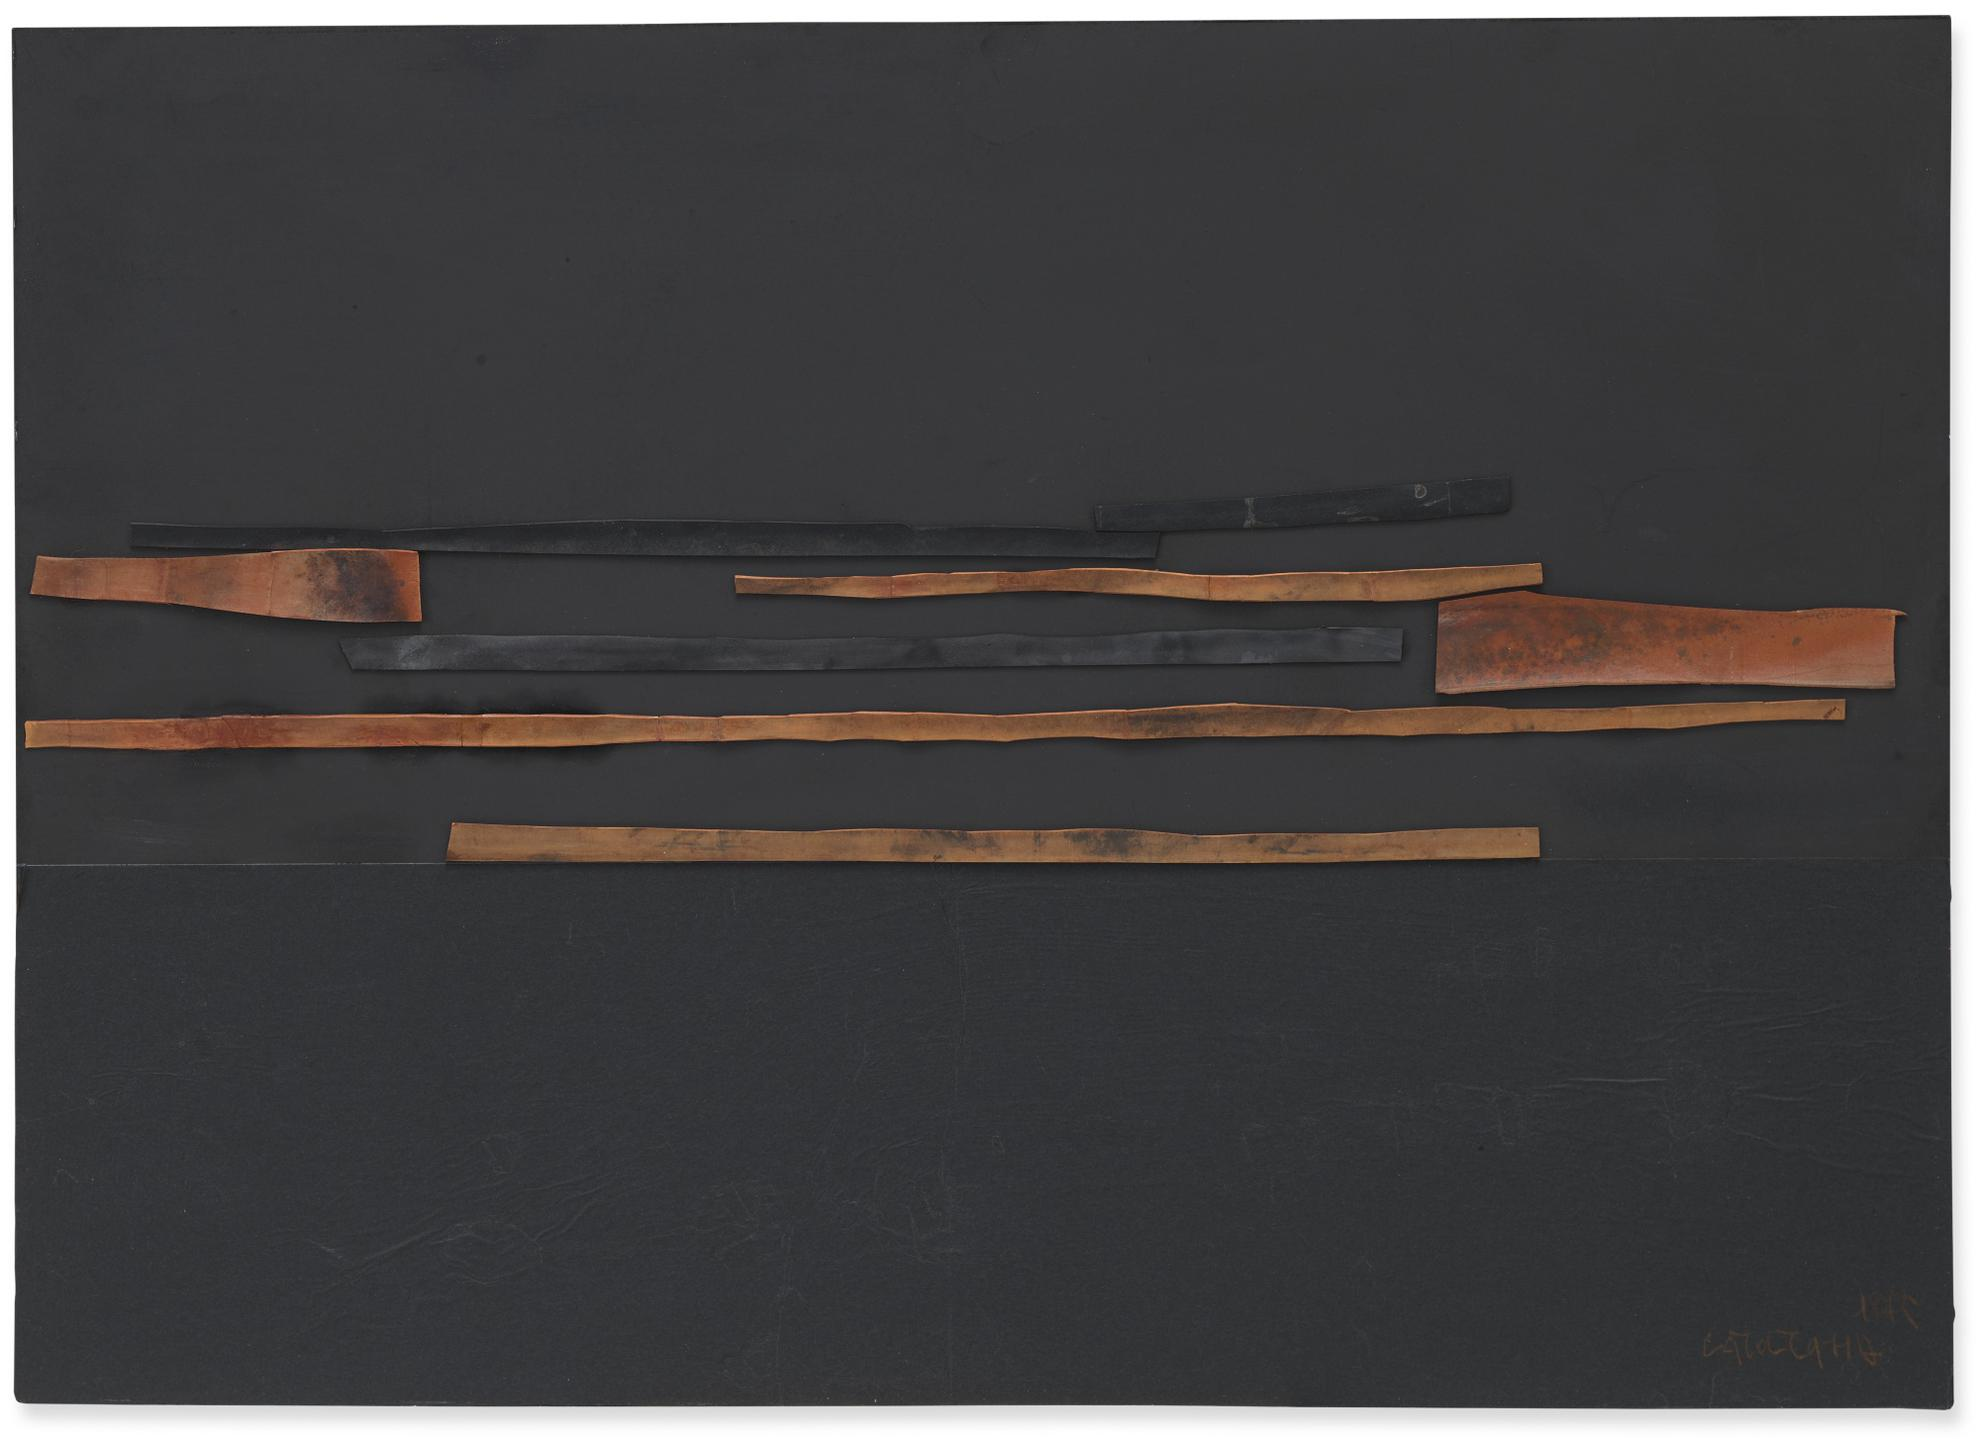 Carol Rama-Senza Titolo-1975